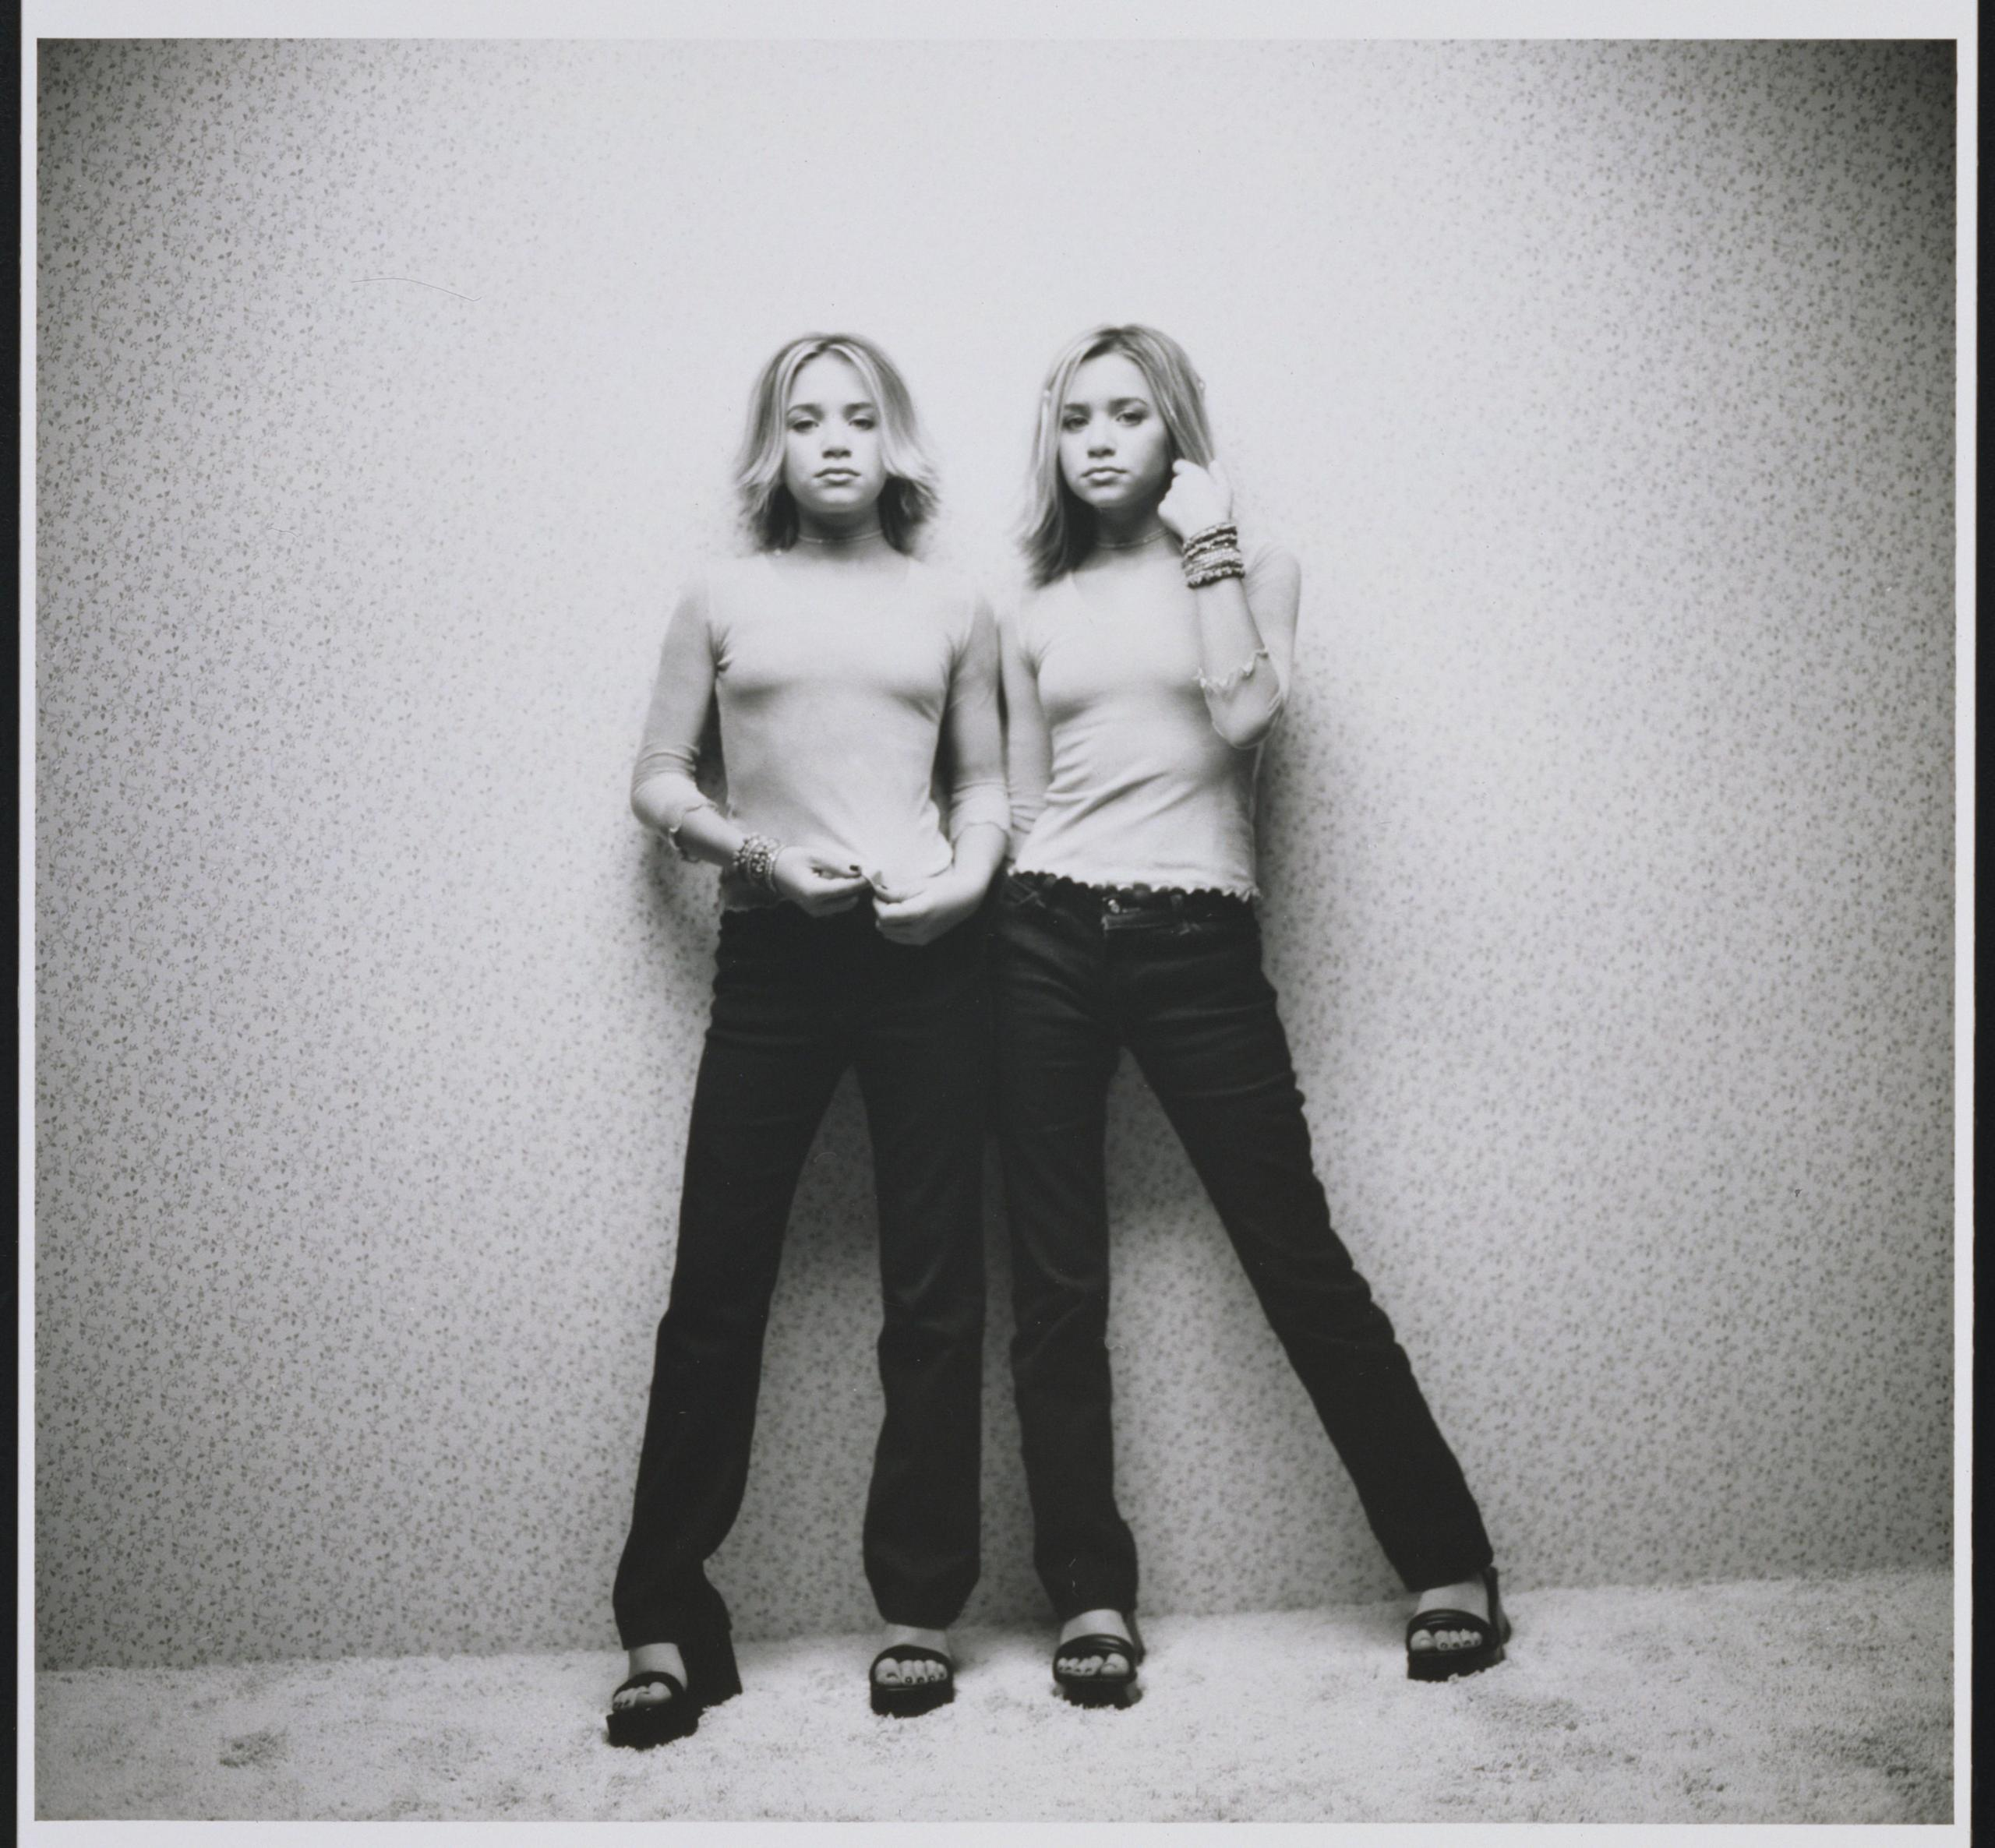 Olsen Twins - Gallery